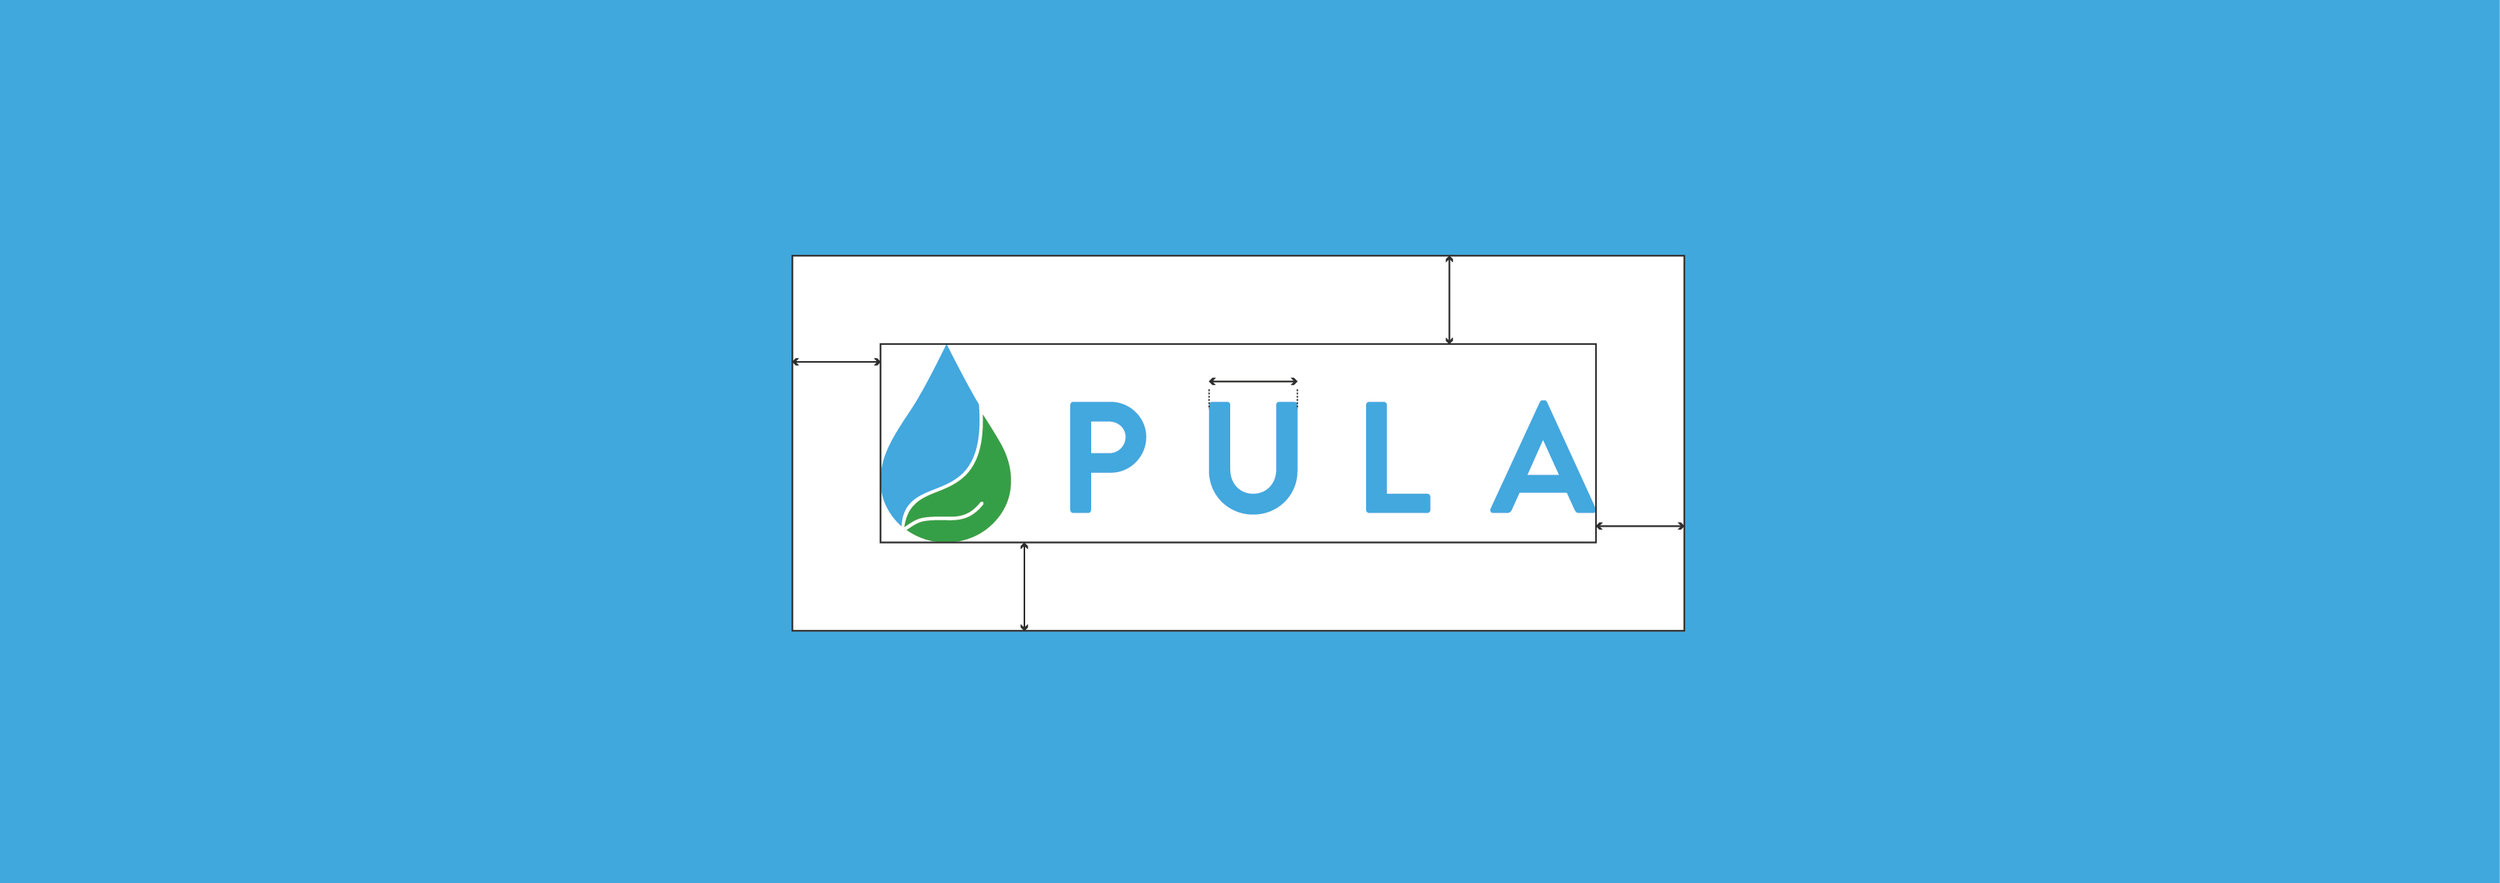 PULA-06.jpg